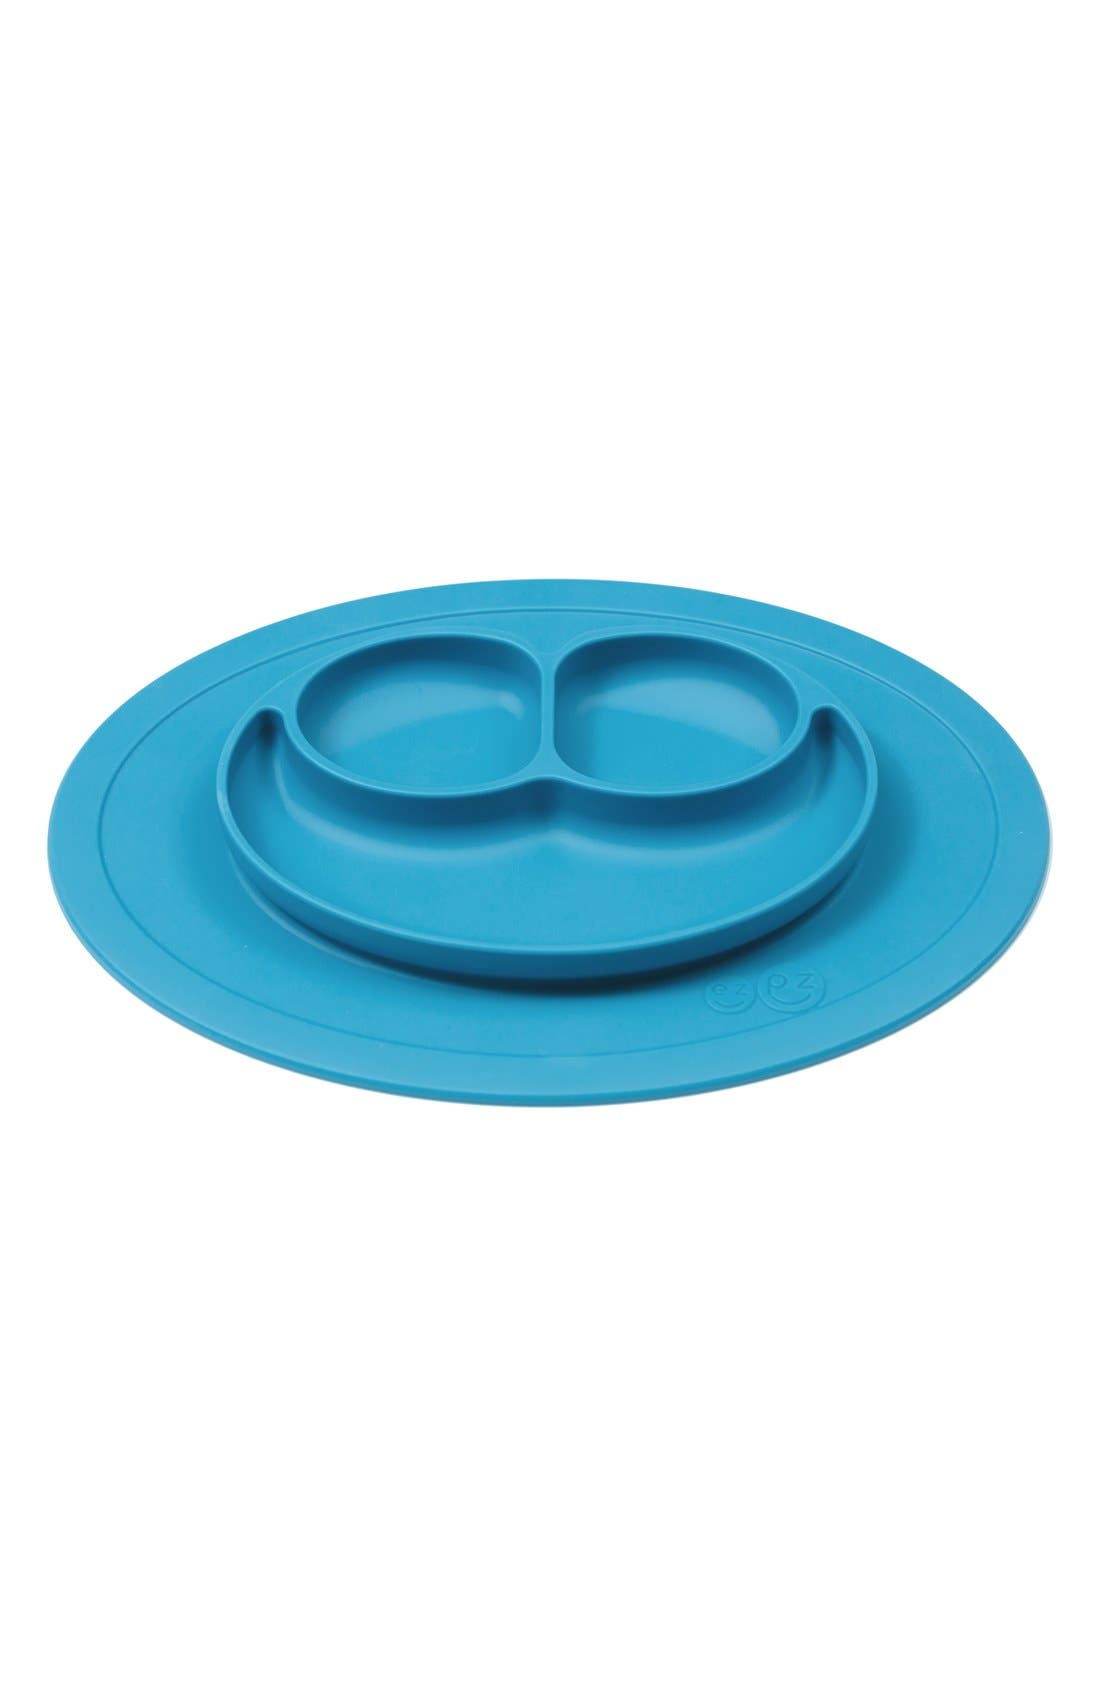 Alternate Image 2  - ezpz 'Mini Mat' Silicone Feeding Mat